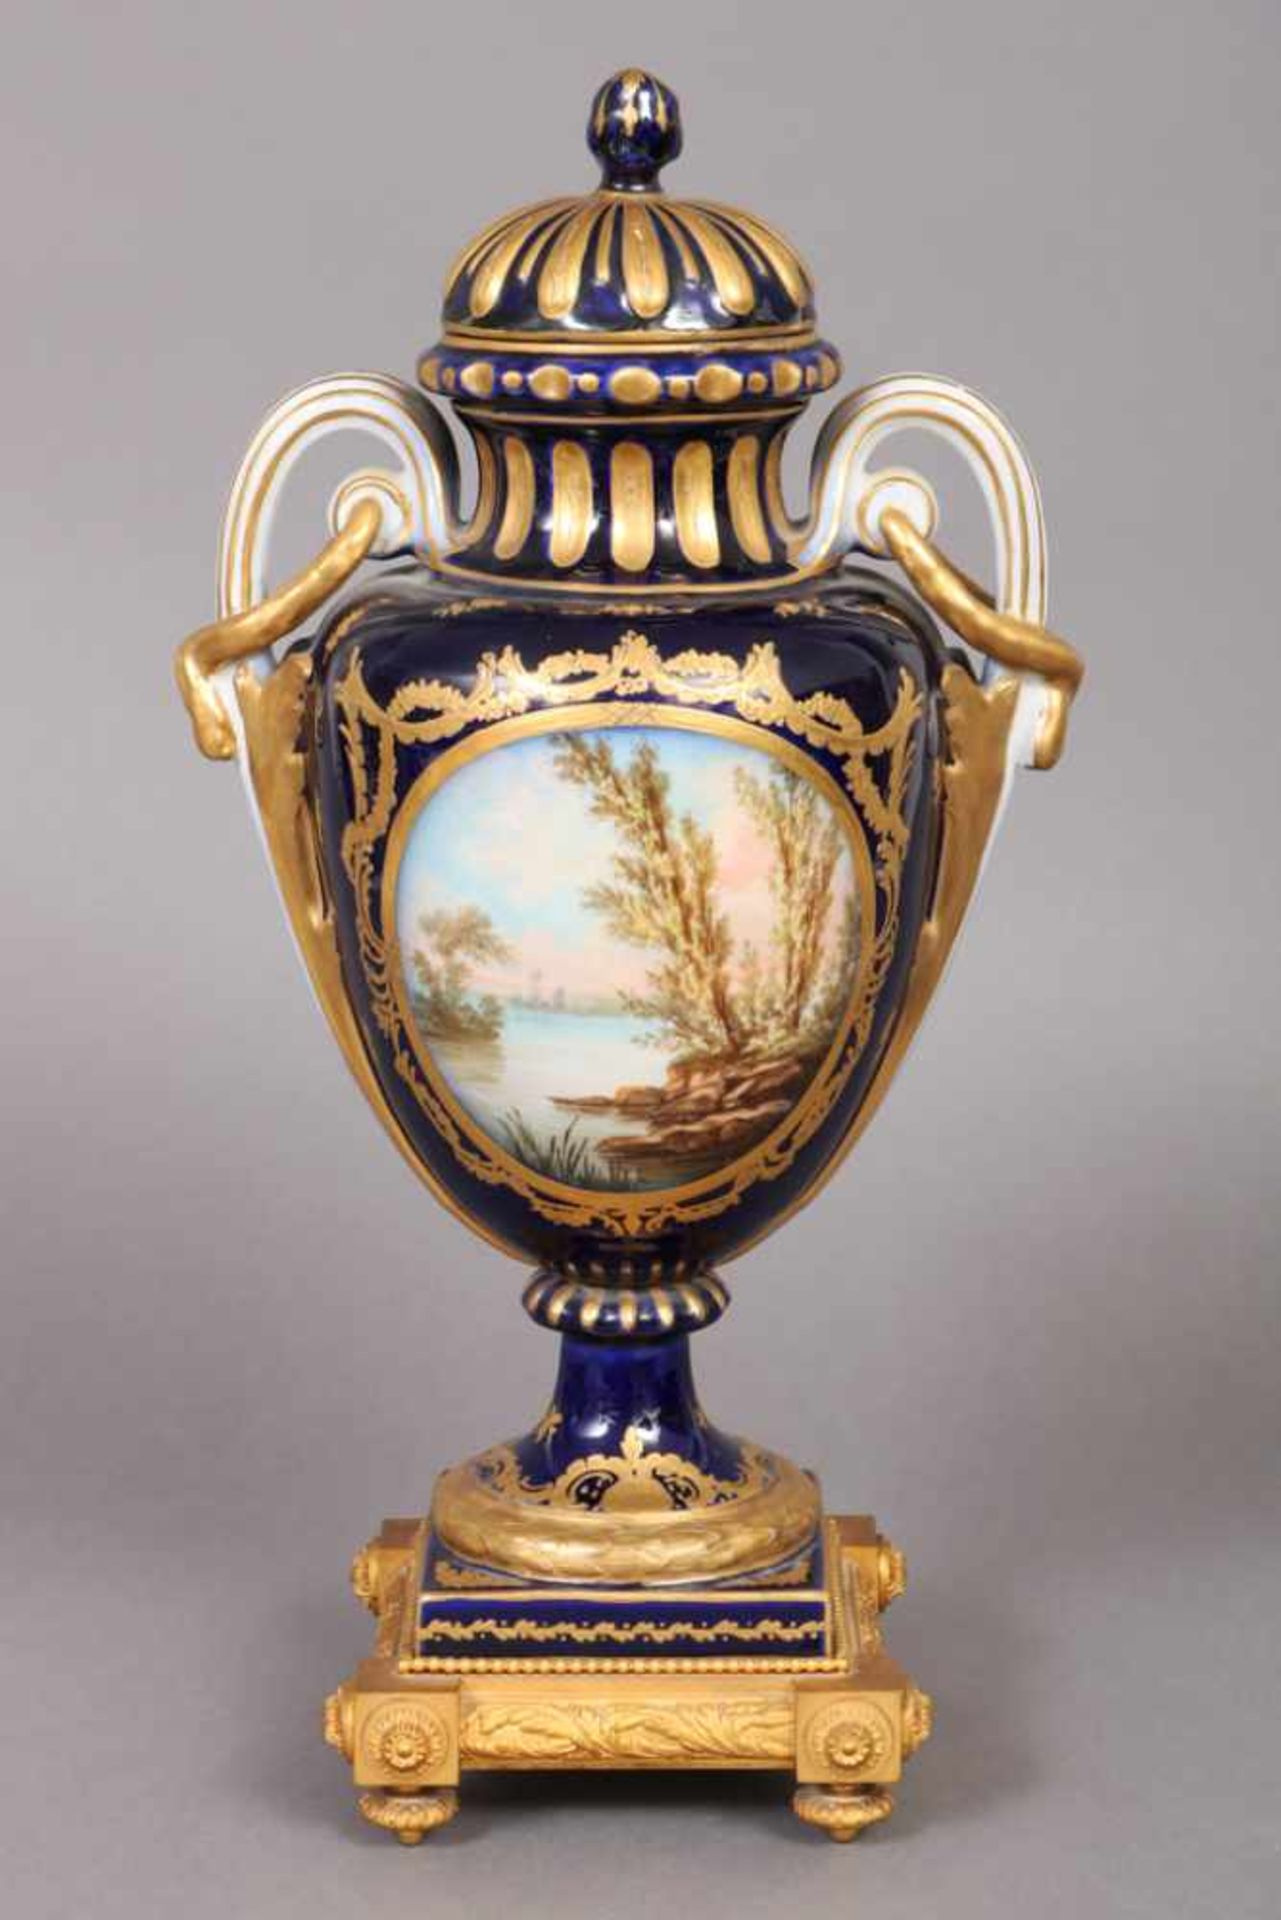 Los 1 - Prunkdeckelvase im Stile Sèvres wohl Ende 19. Jhdt., amphorenförmiger Korpus auf gekehltem Rundfuß